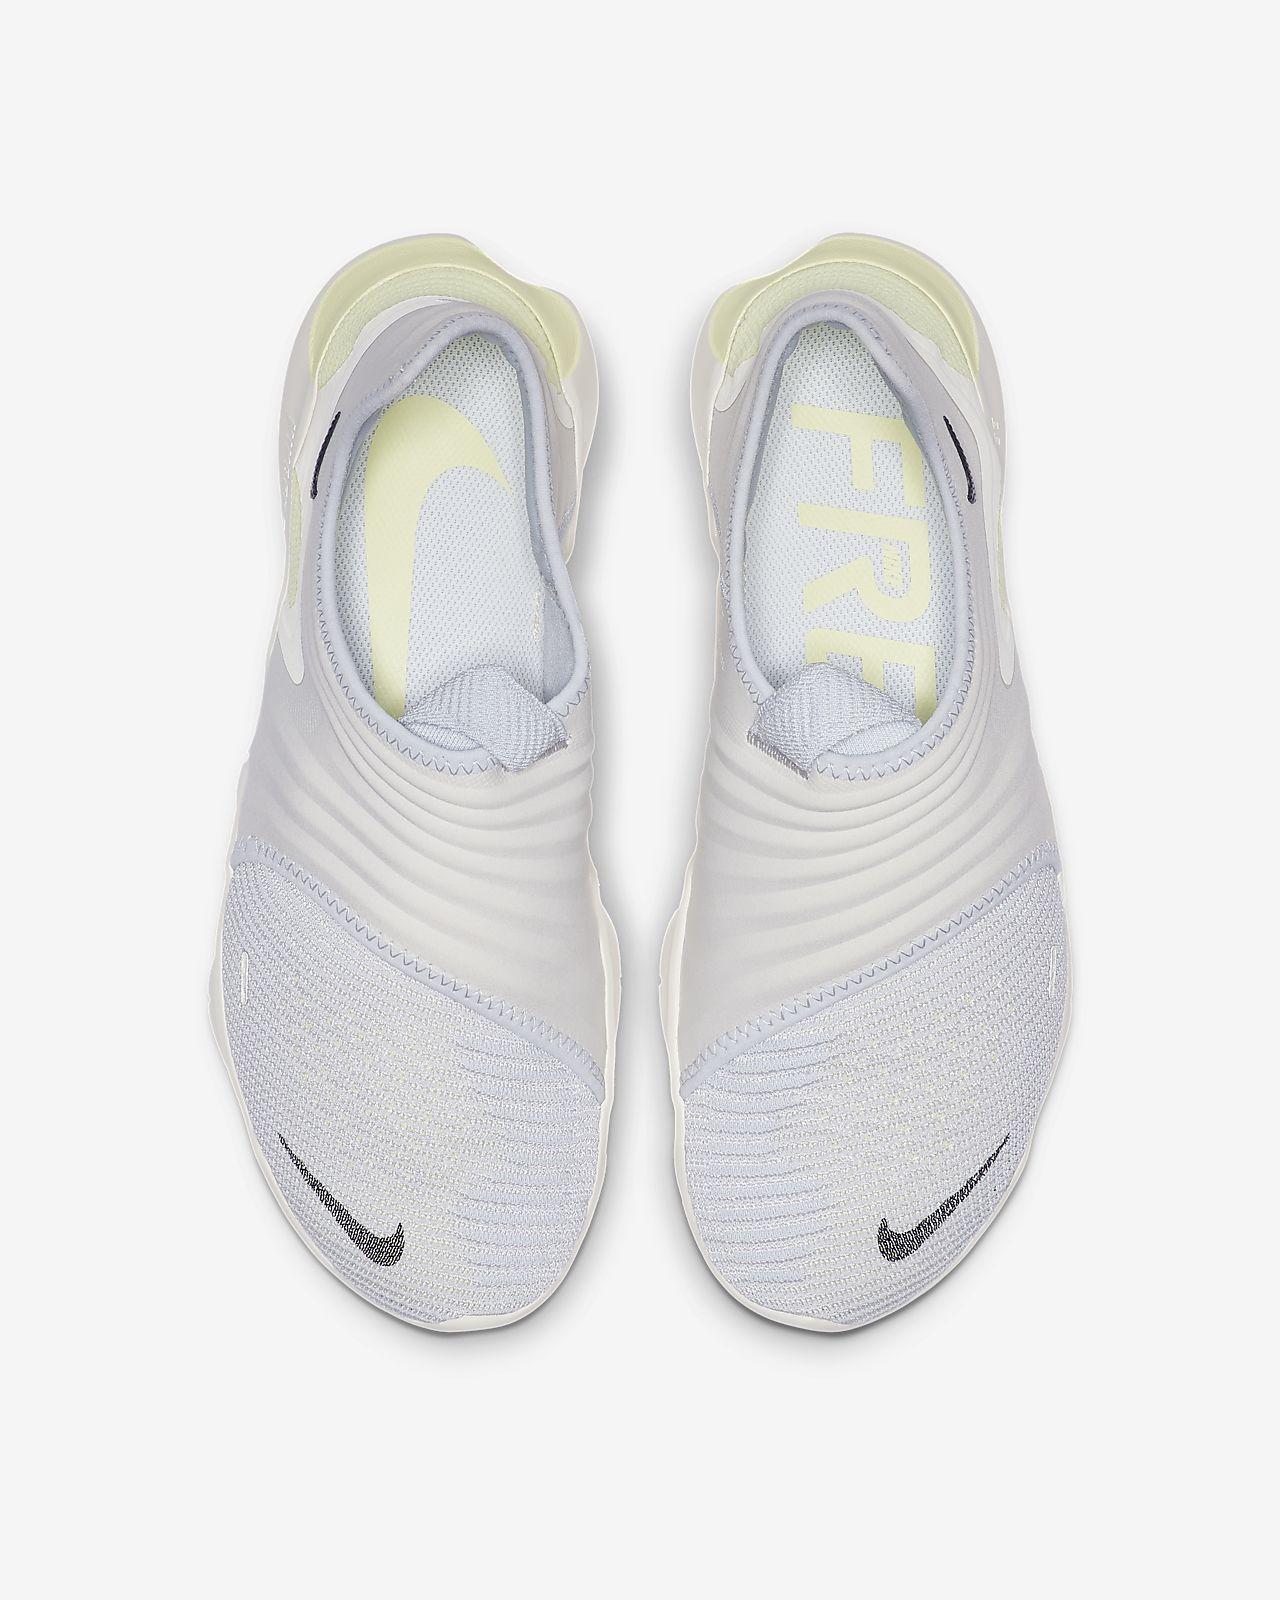 b68a6b16aeab Nike Free RN Flyknit 3.0 Men s Running Shoe. Nike.com GB